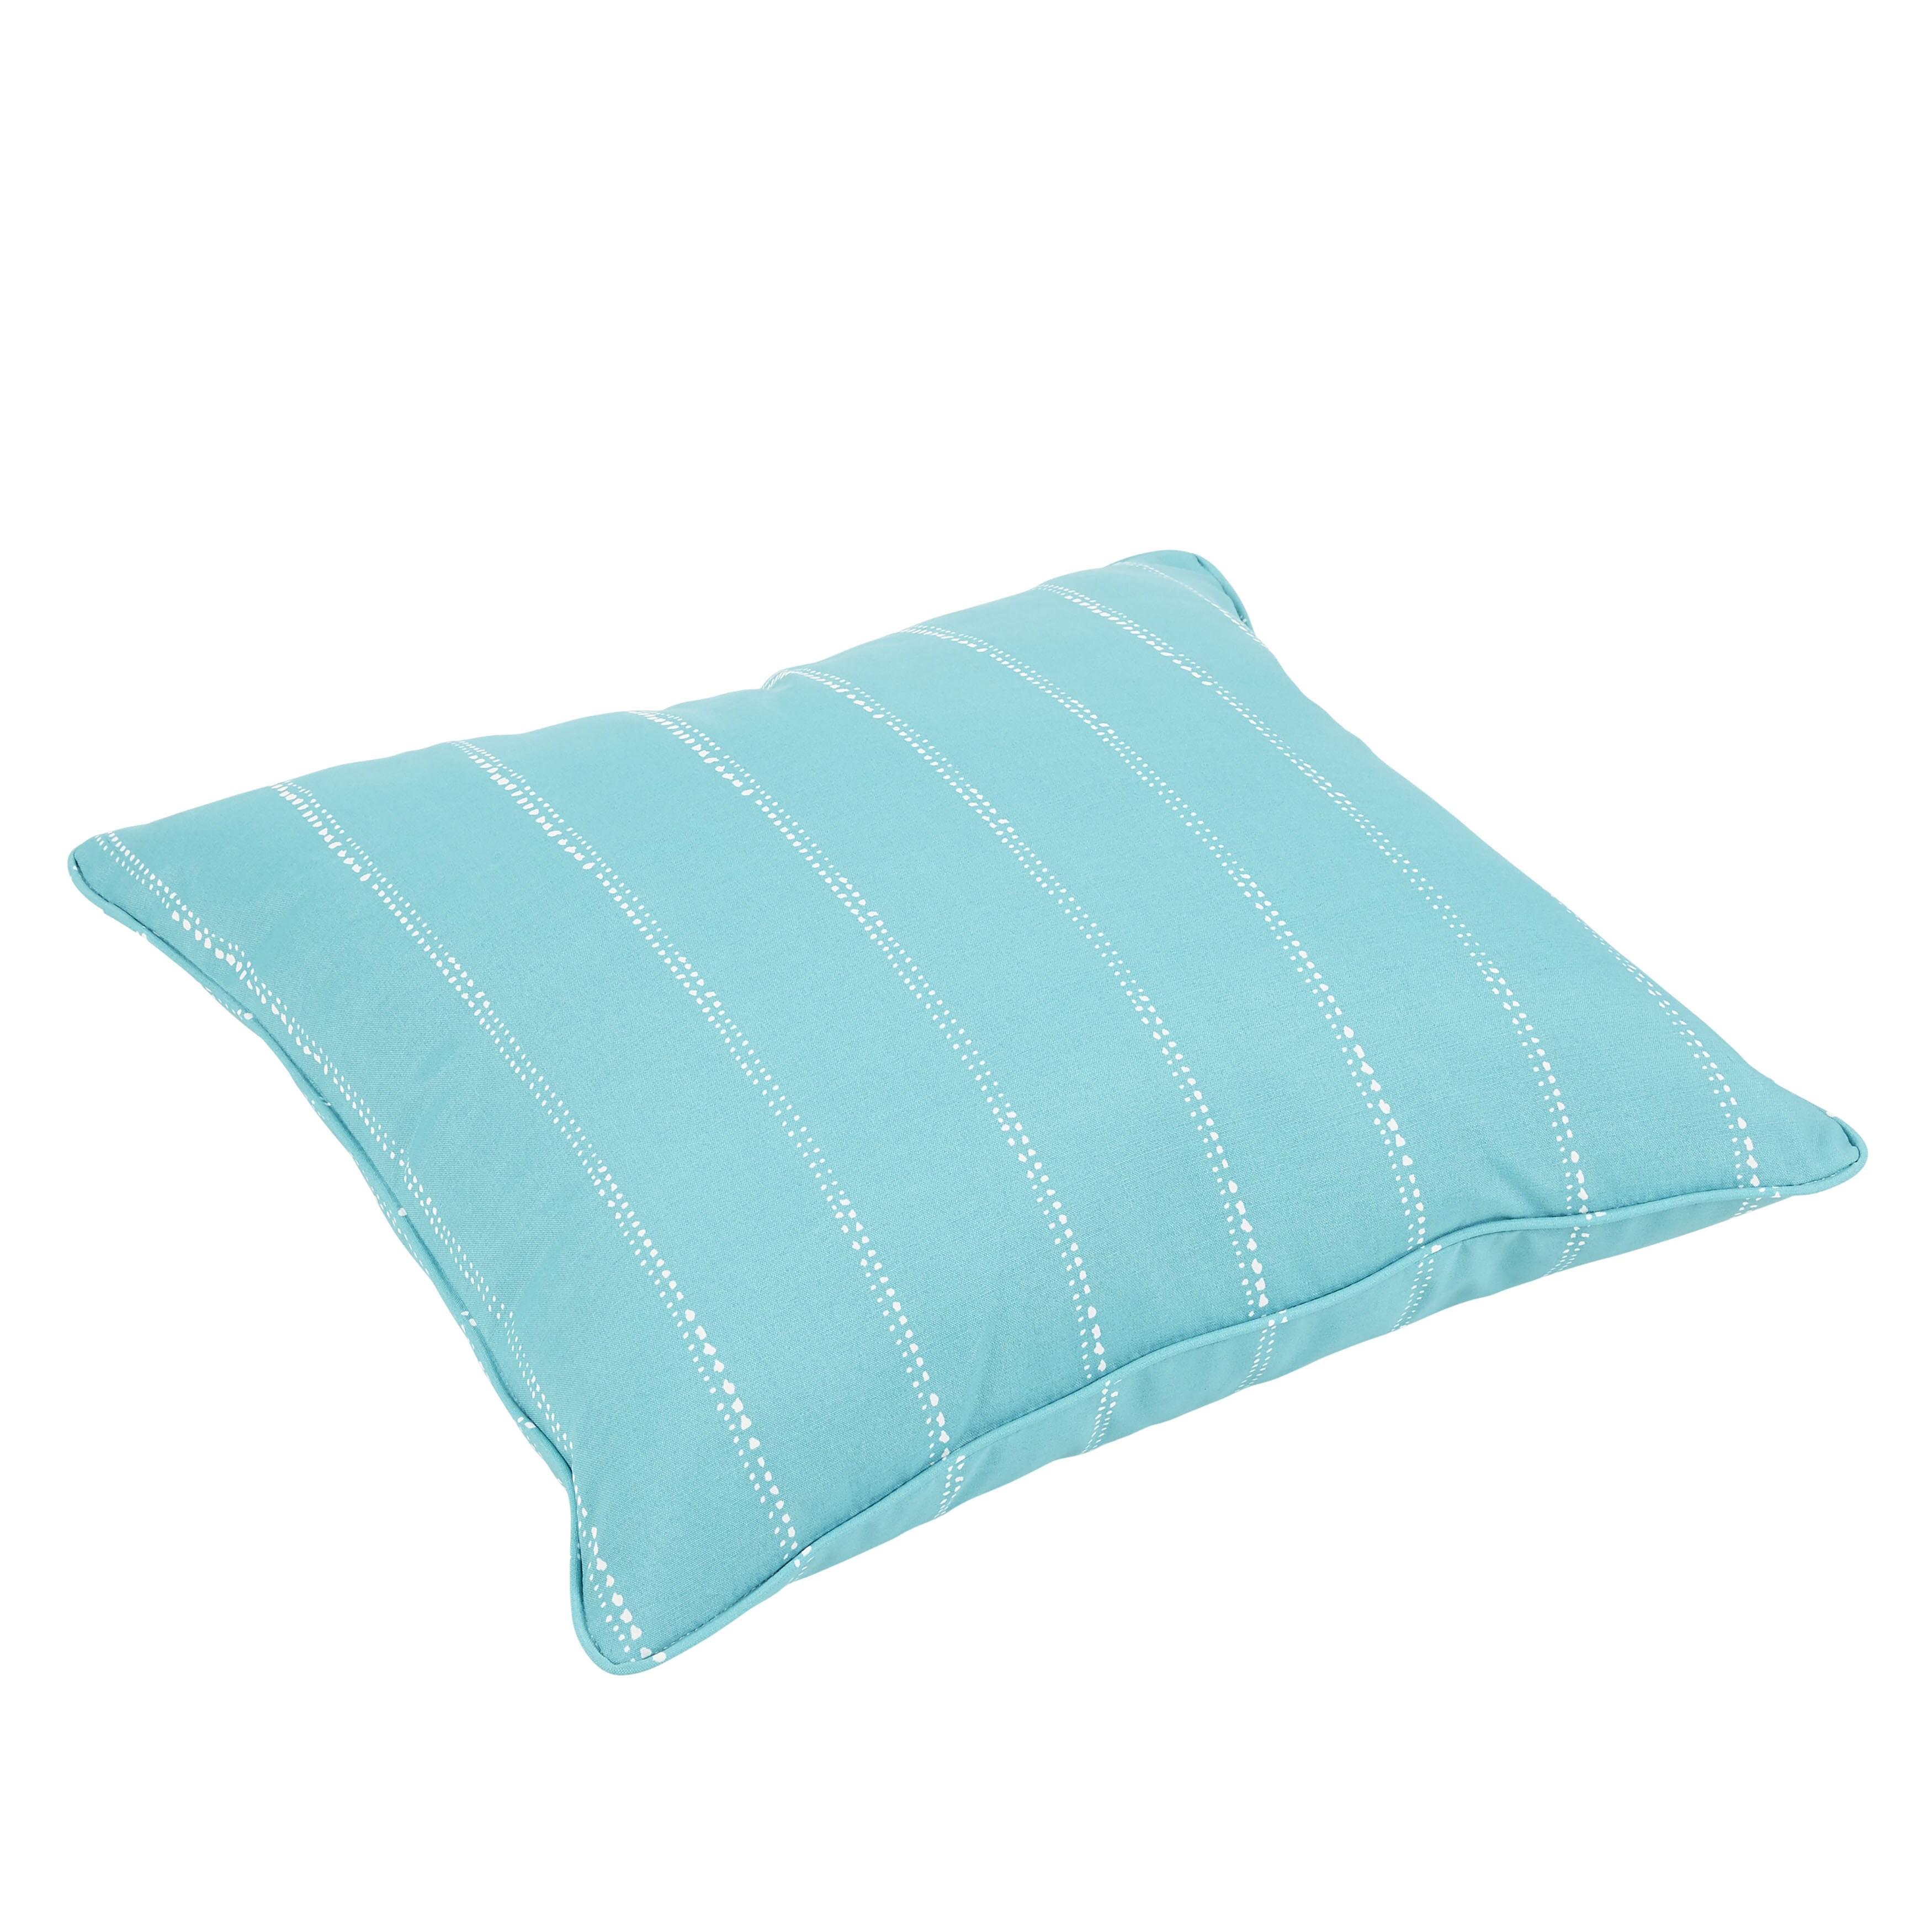 Caldwell Aqua Dotted Stripes Indoor Outdoor 26 Inch Corded Floor Pillow